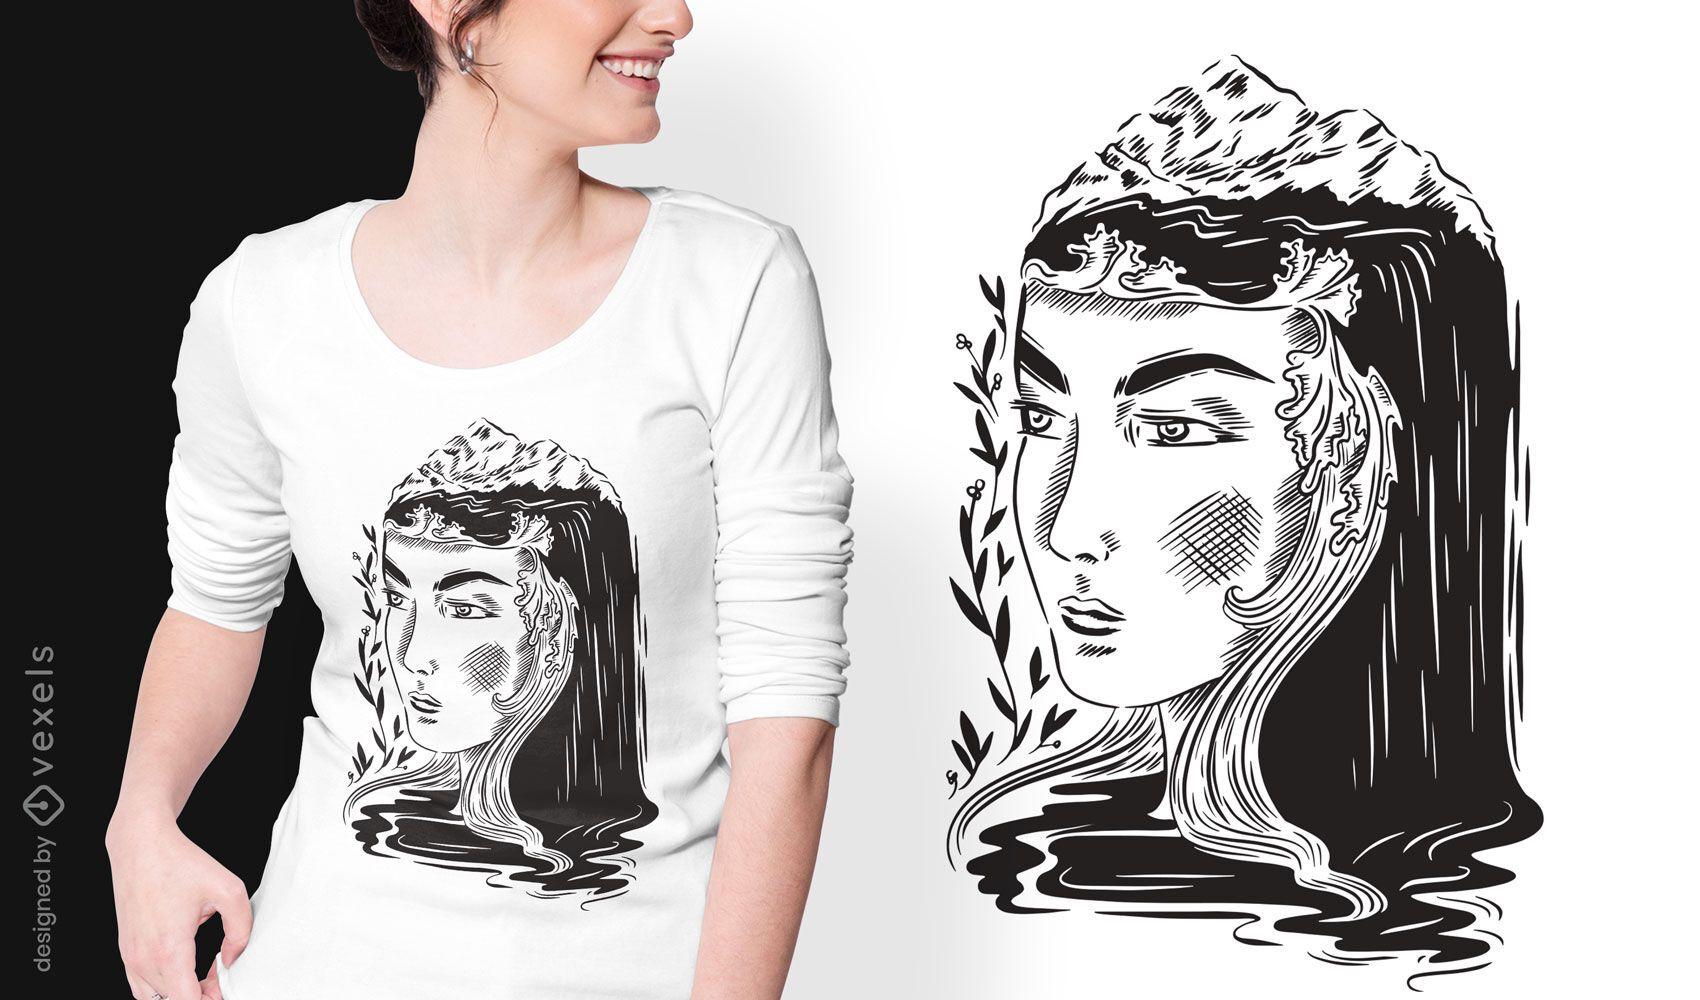 Nature woman dark art nouveau t-shirt design